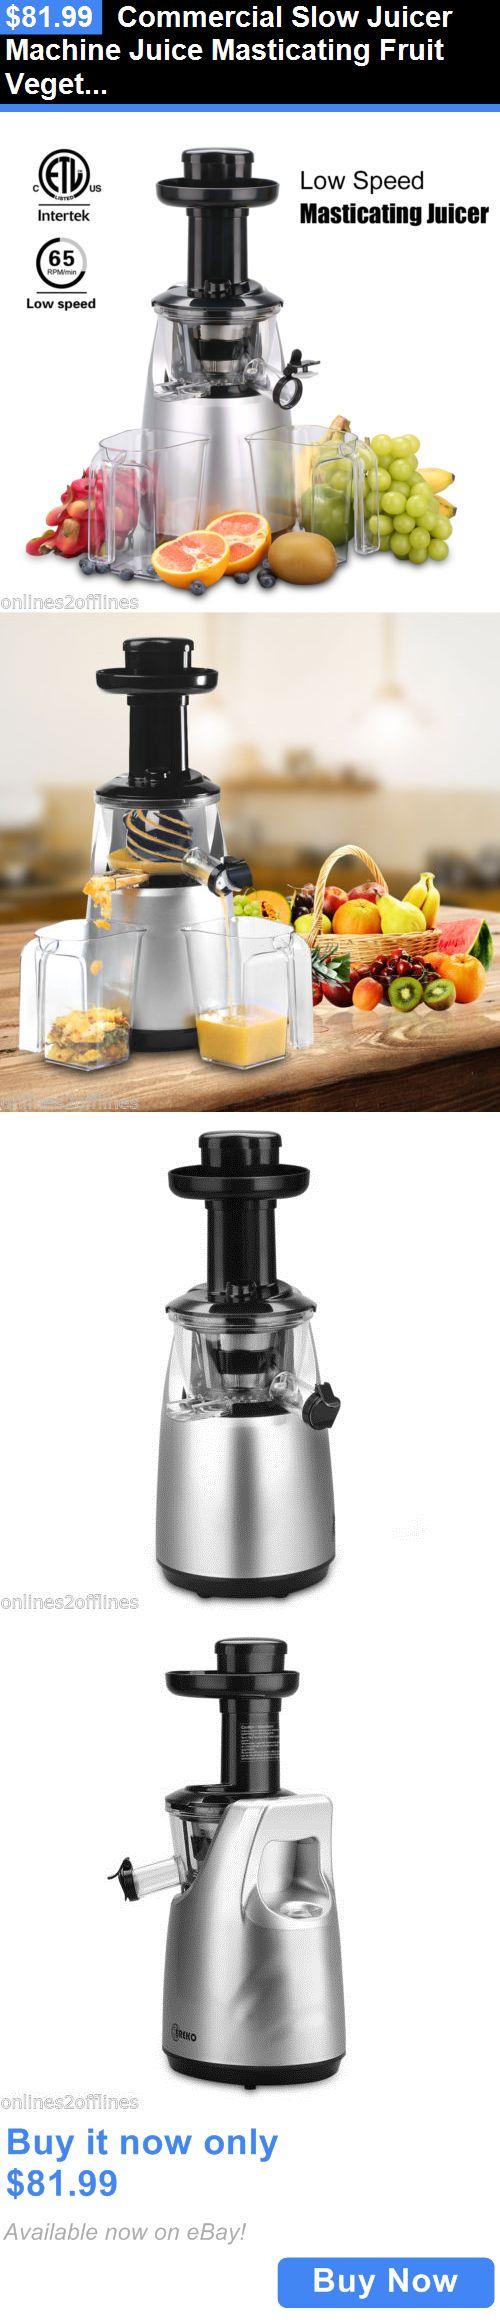 Uncategorized Small Kitchen Appliances Online best 25 small juicer ideas on pinterest kitchen appliances commercial slow machine juice masticating fruit vegetable extractor maker buy it